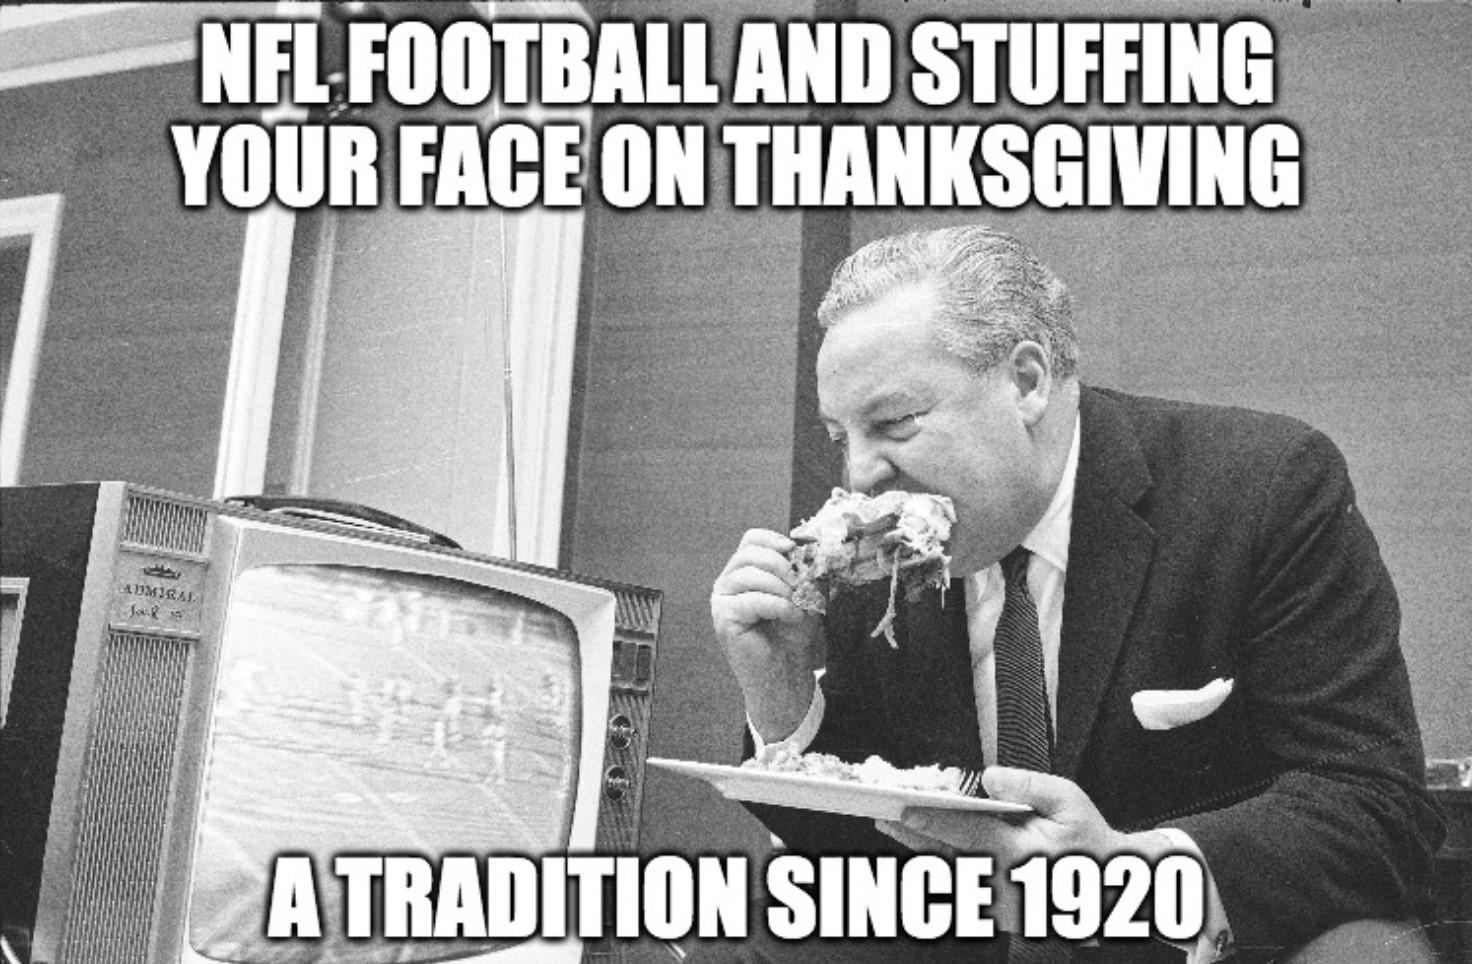 American Football League founder Harry Wismer